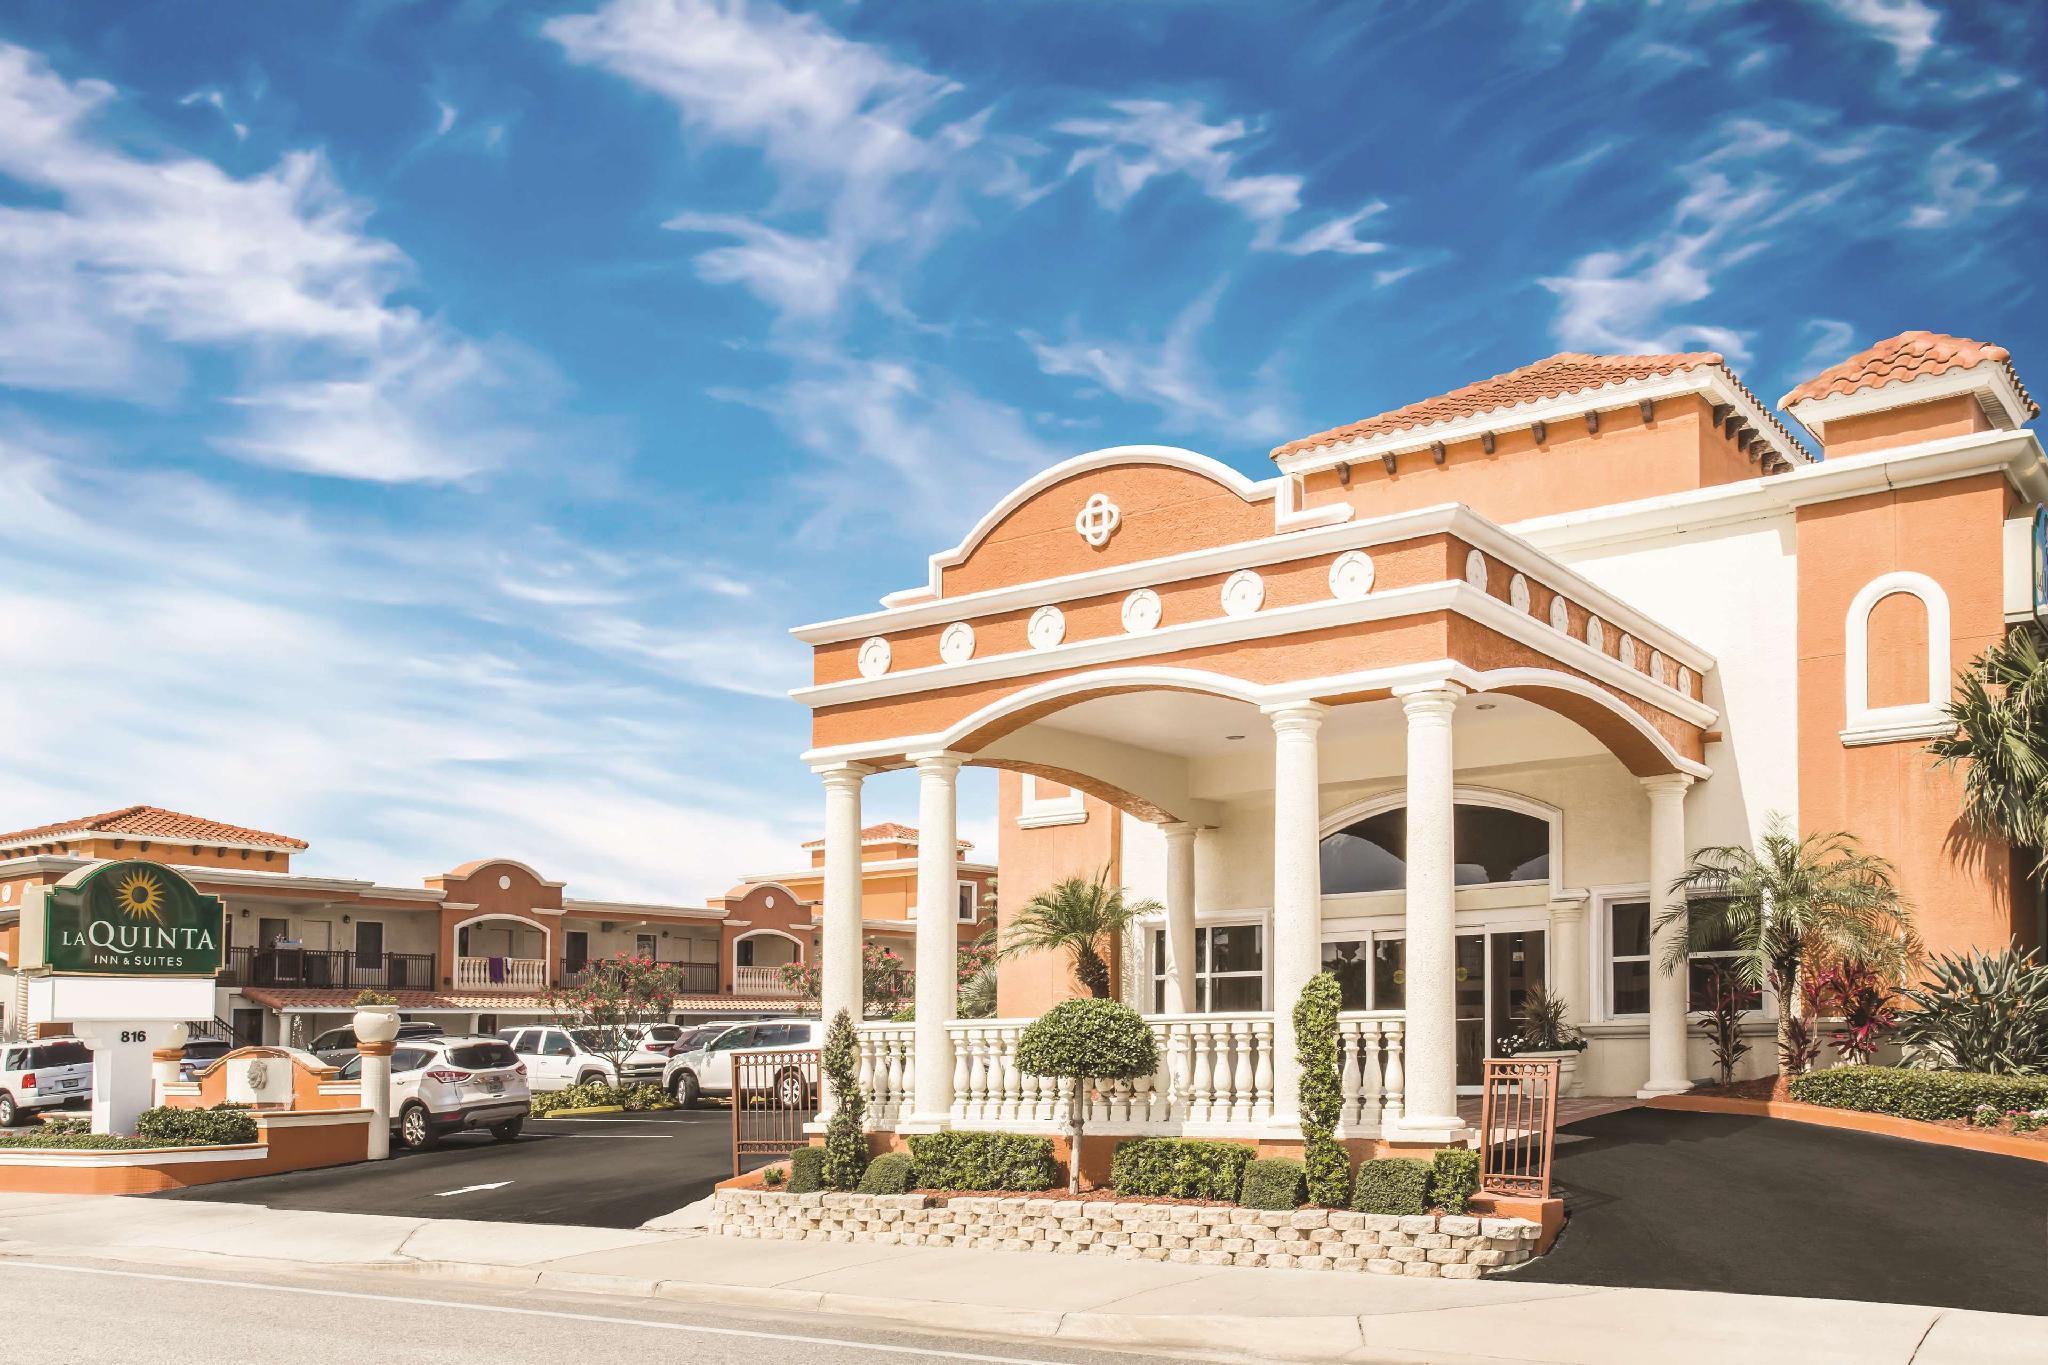 La Quinta Inn And Suites By Wyndham Oceanfront Daytona Beach